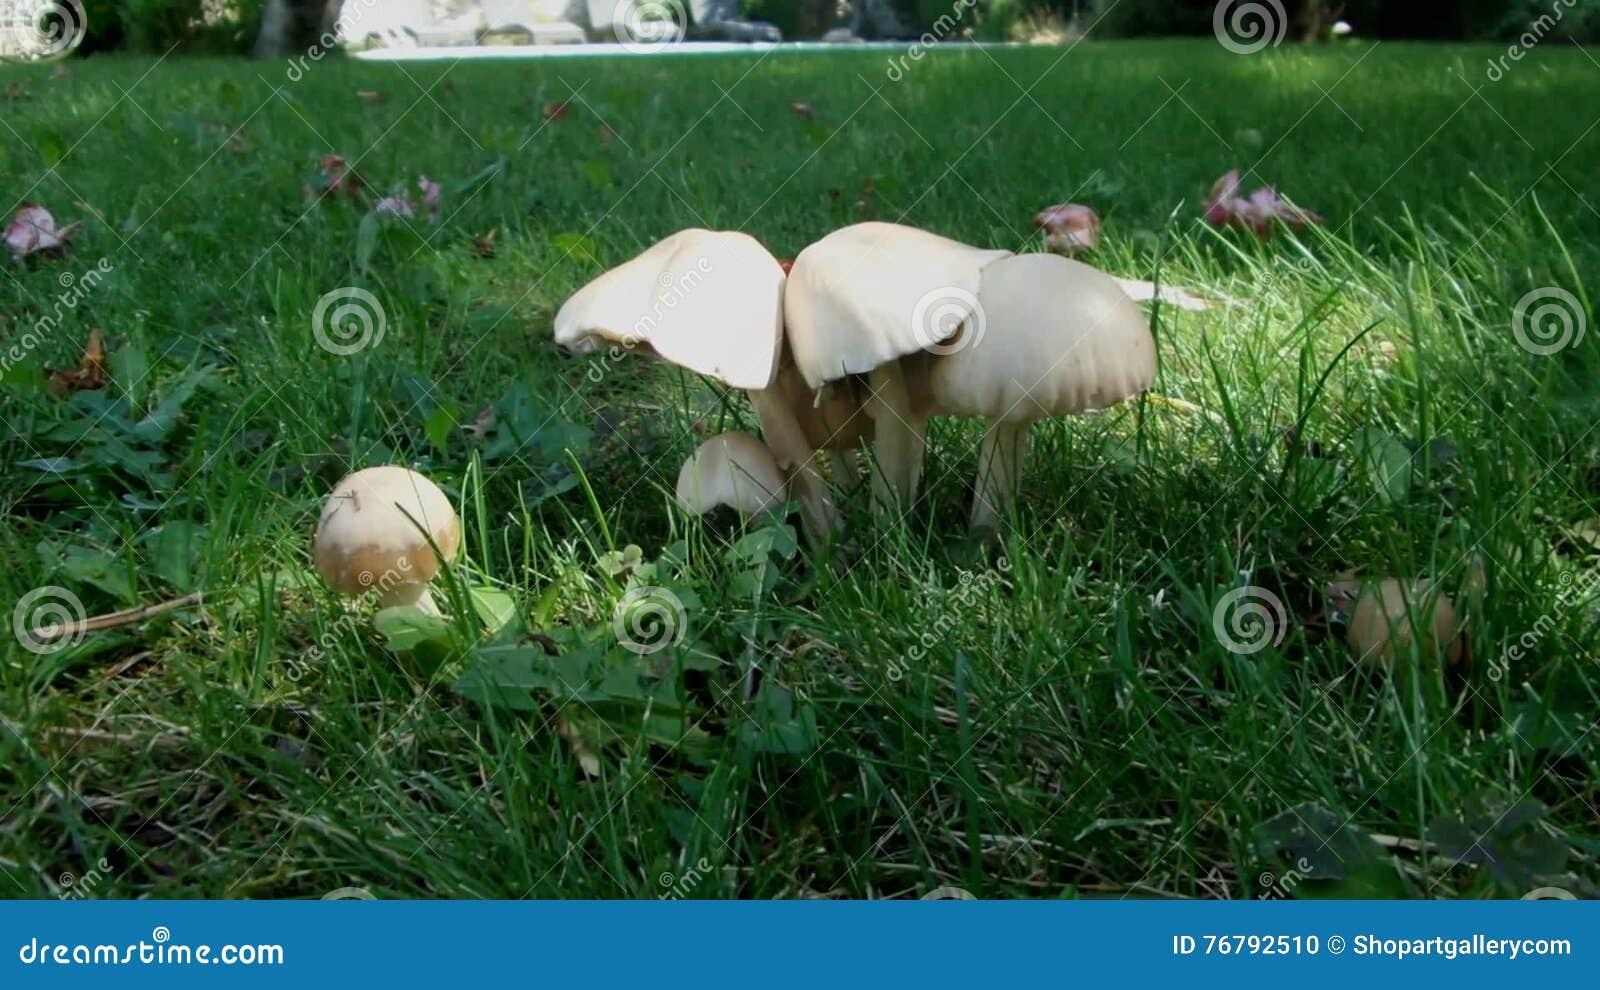 recipe: svampar i gräsmattan bilder [19]